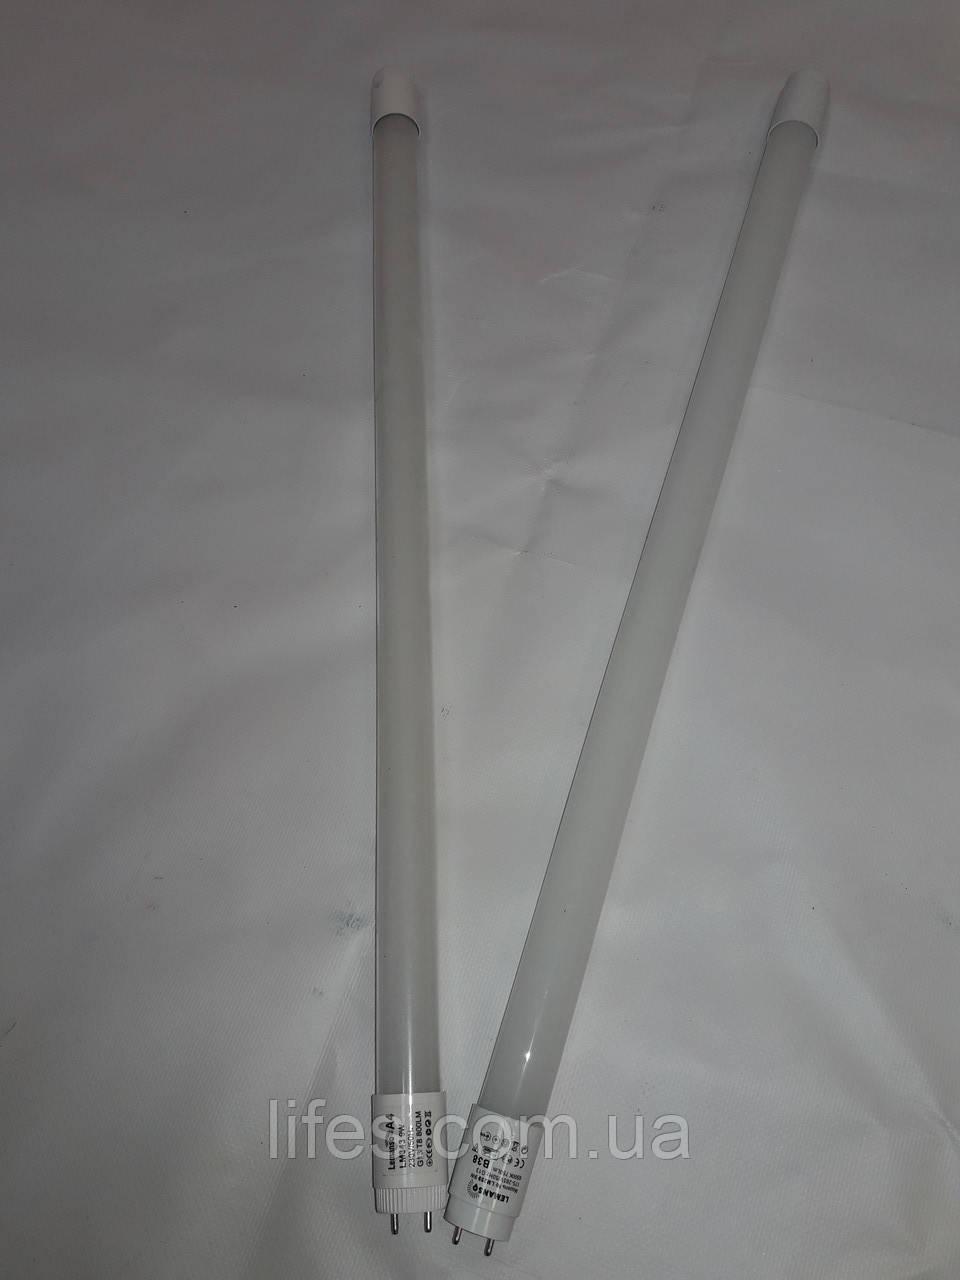 Светодиодная лампа LEMANSO LM343, 6000-6500К, T8, 9 Вт, 750Lm